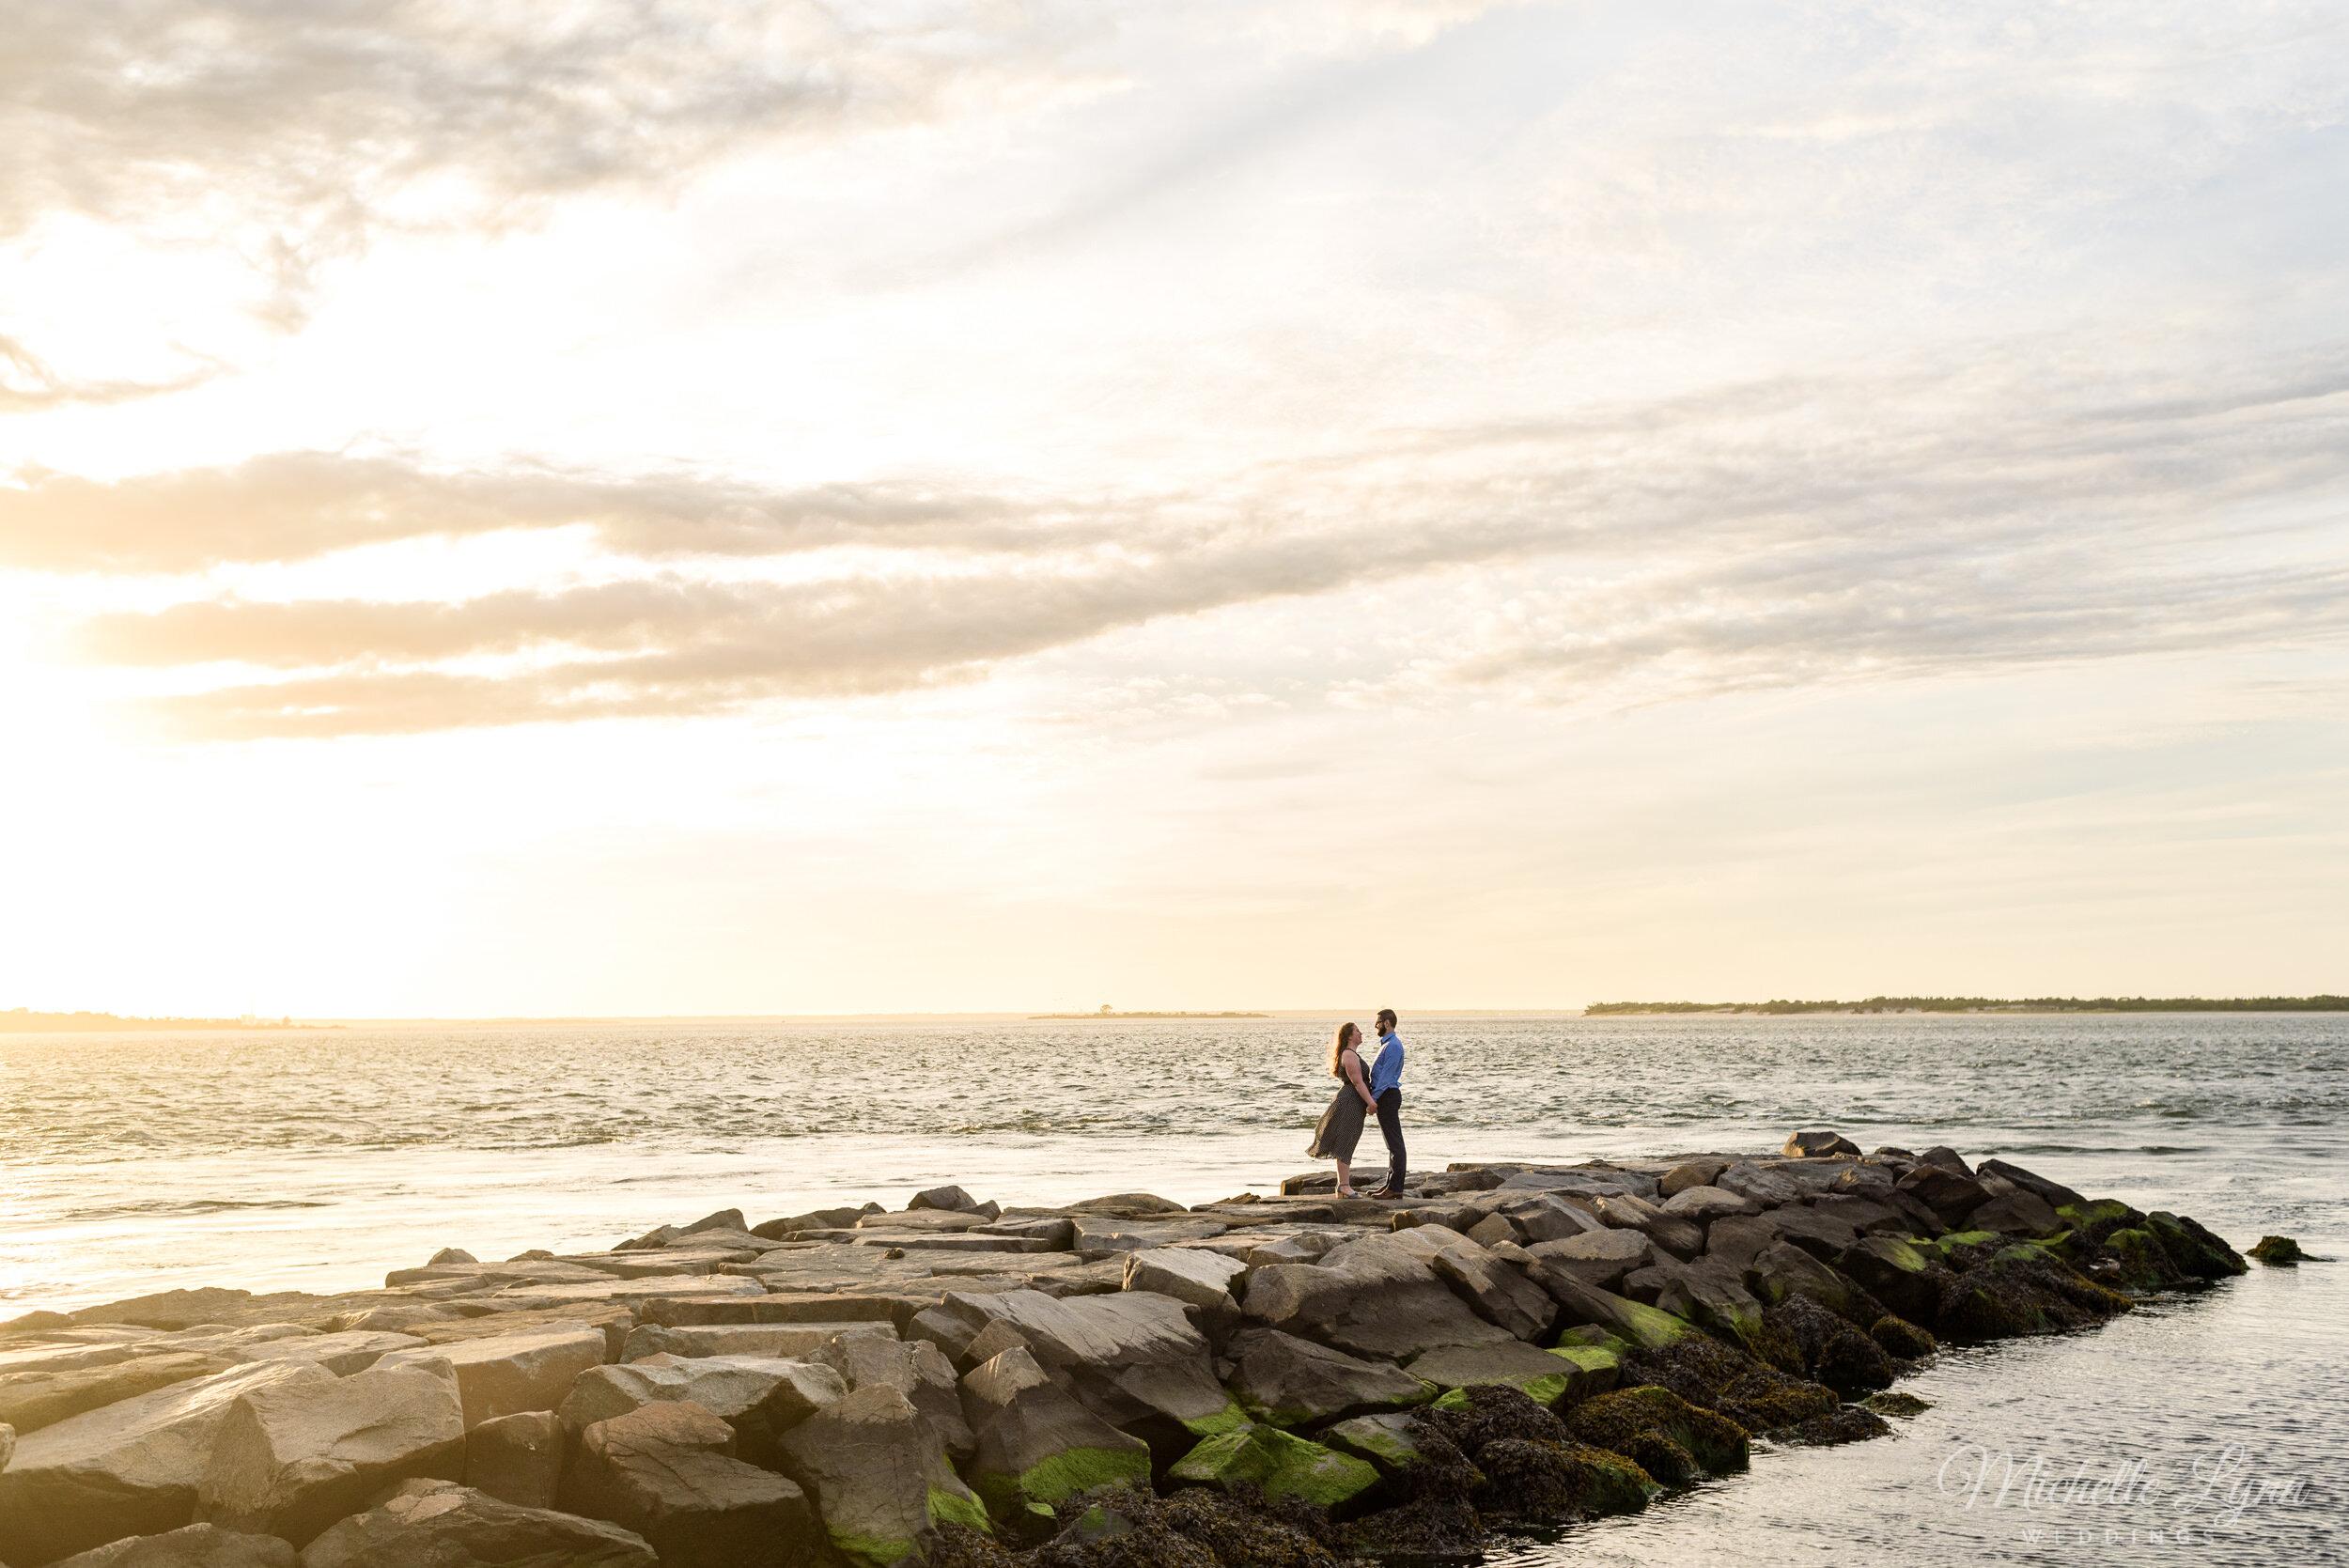 barnegat-lighthouse-engagement-photos-michelle-lynn-weddings-18.jpg